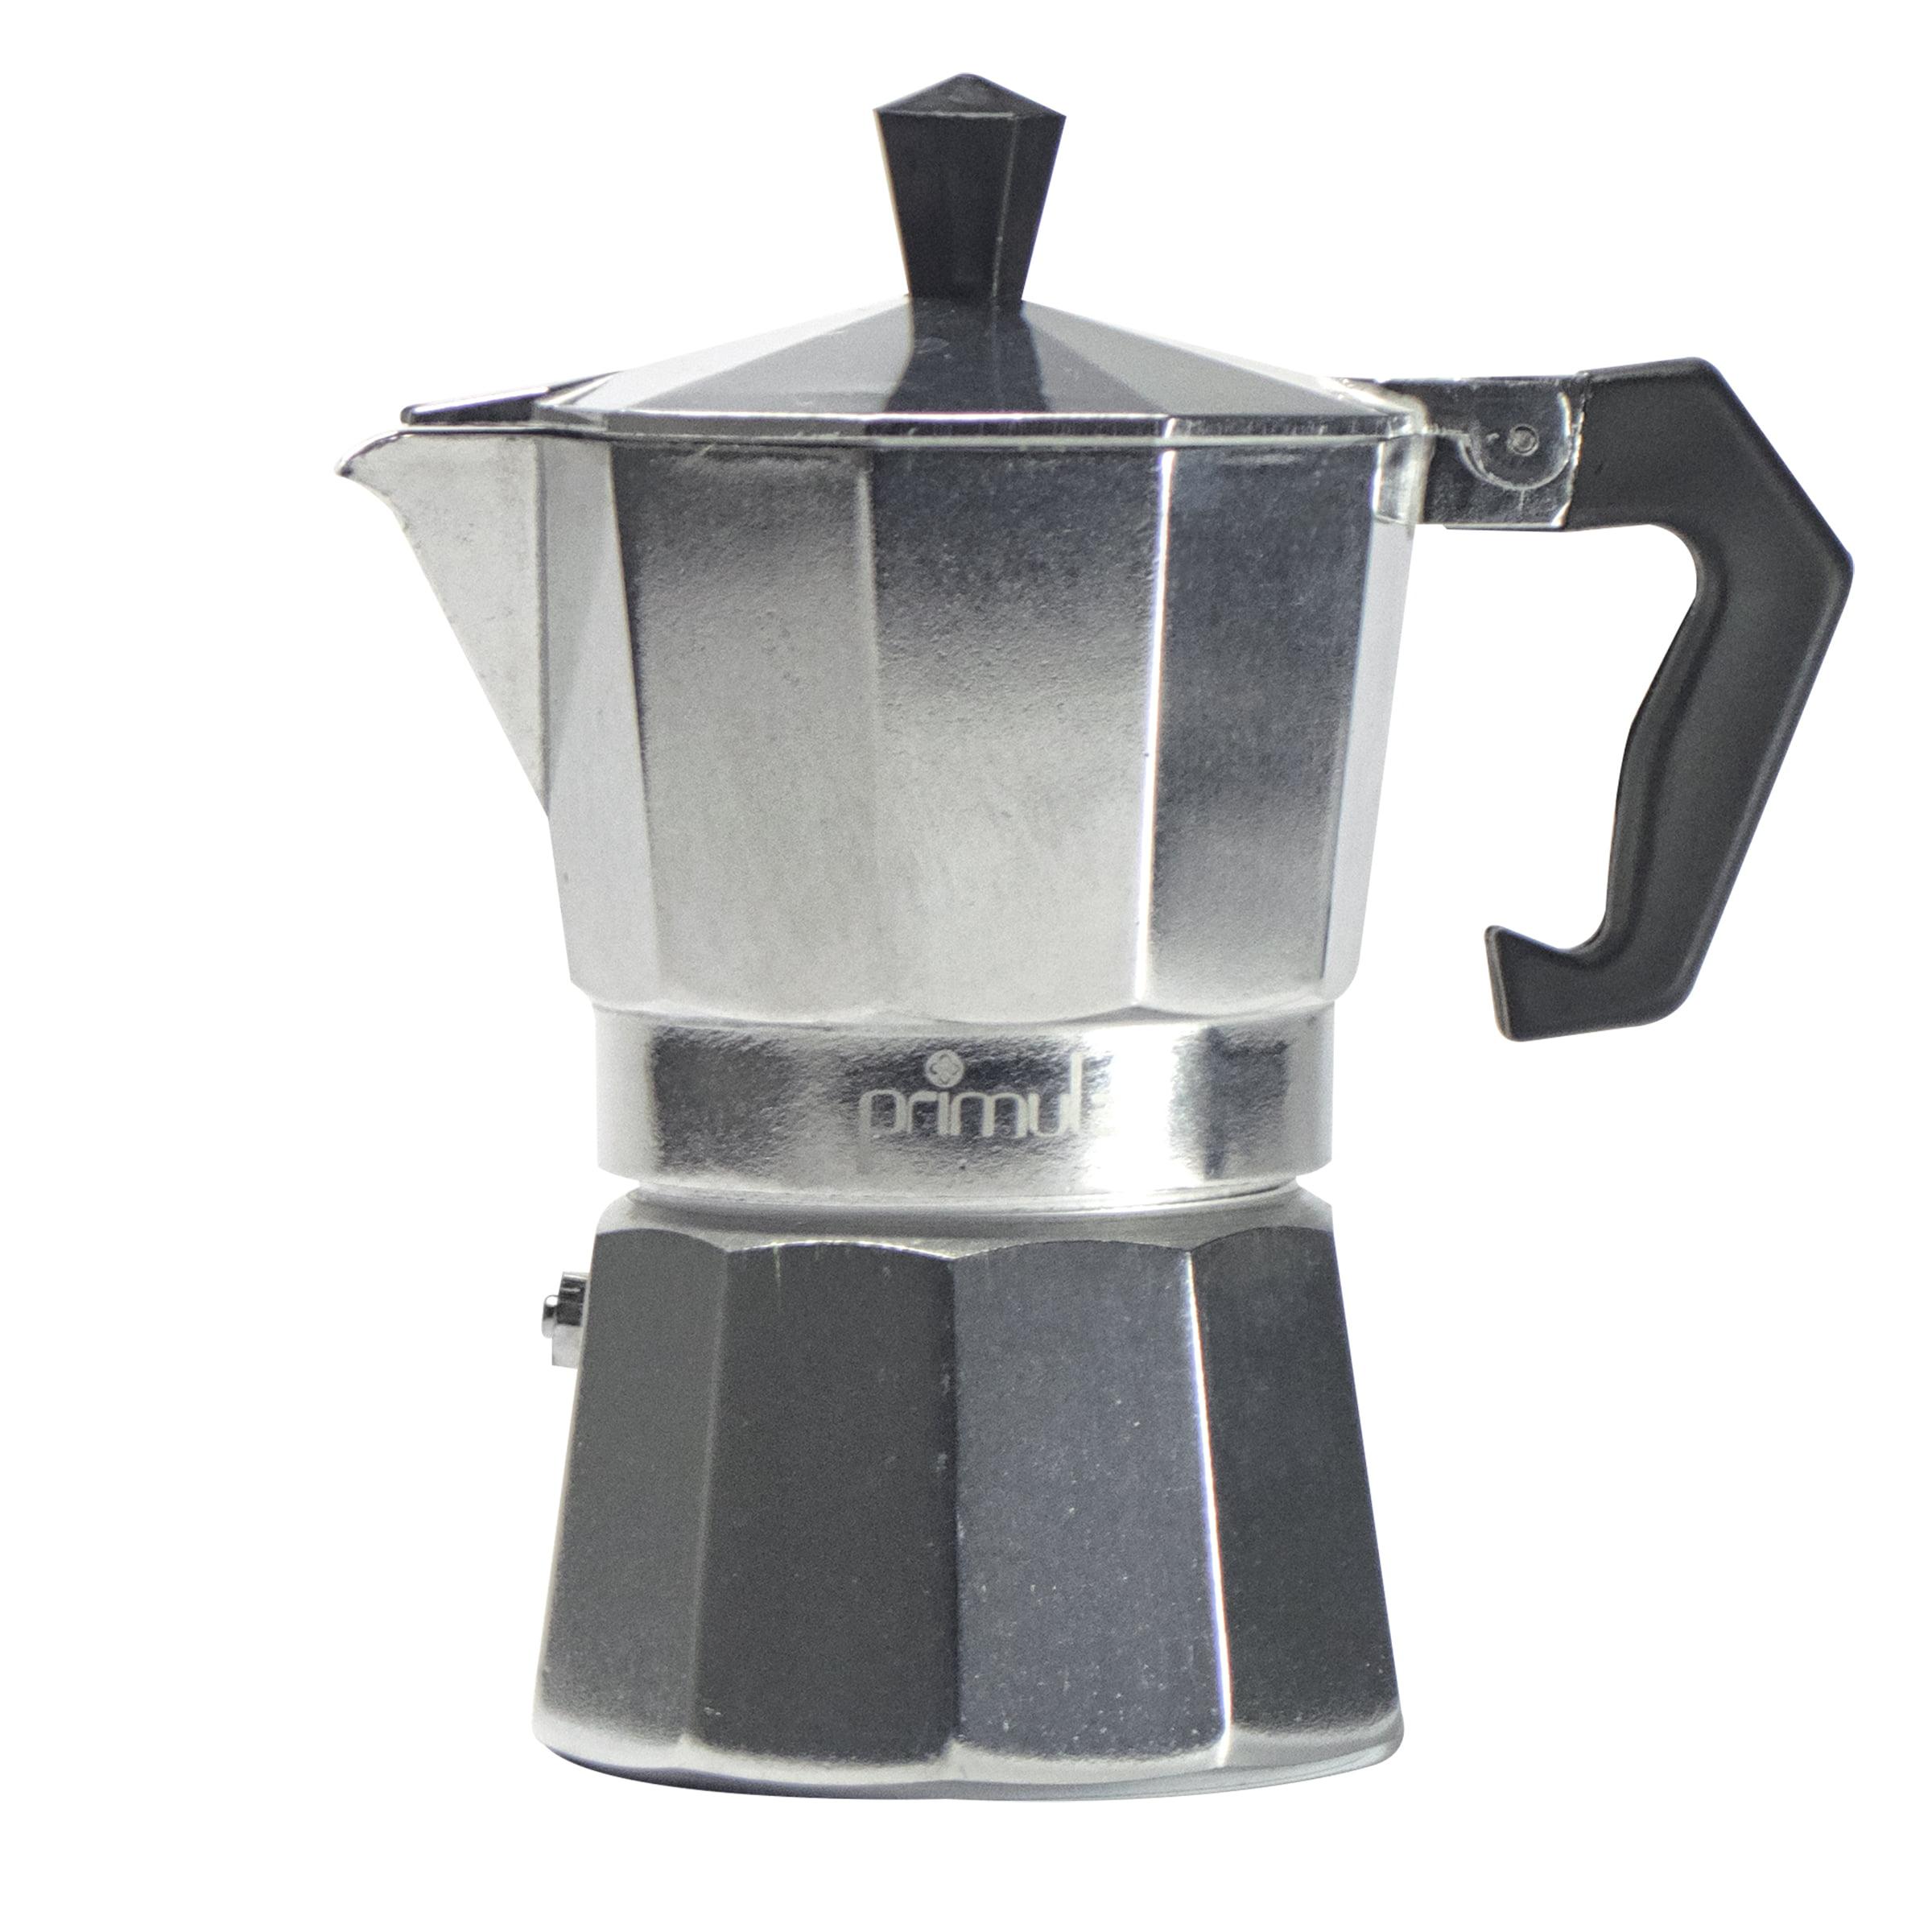 Aluminum 3 Cup Stovetop Espresso Maker - Polished